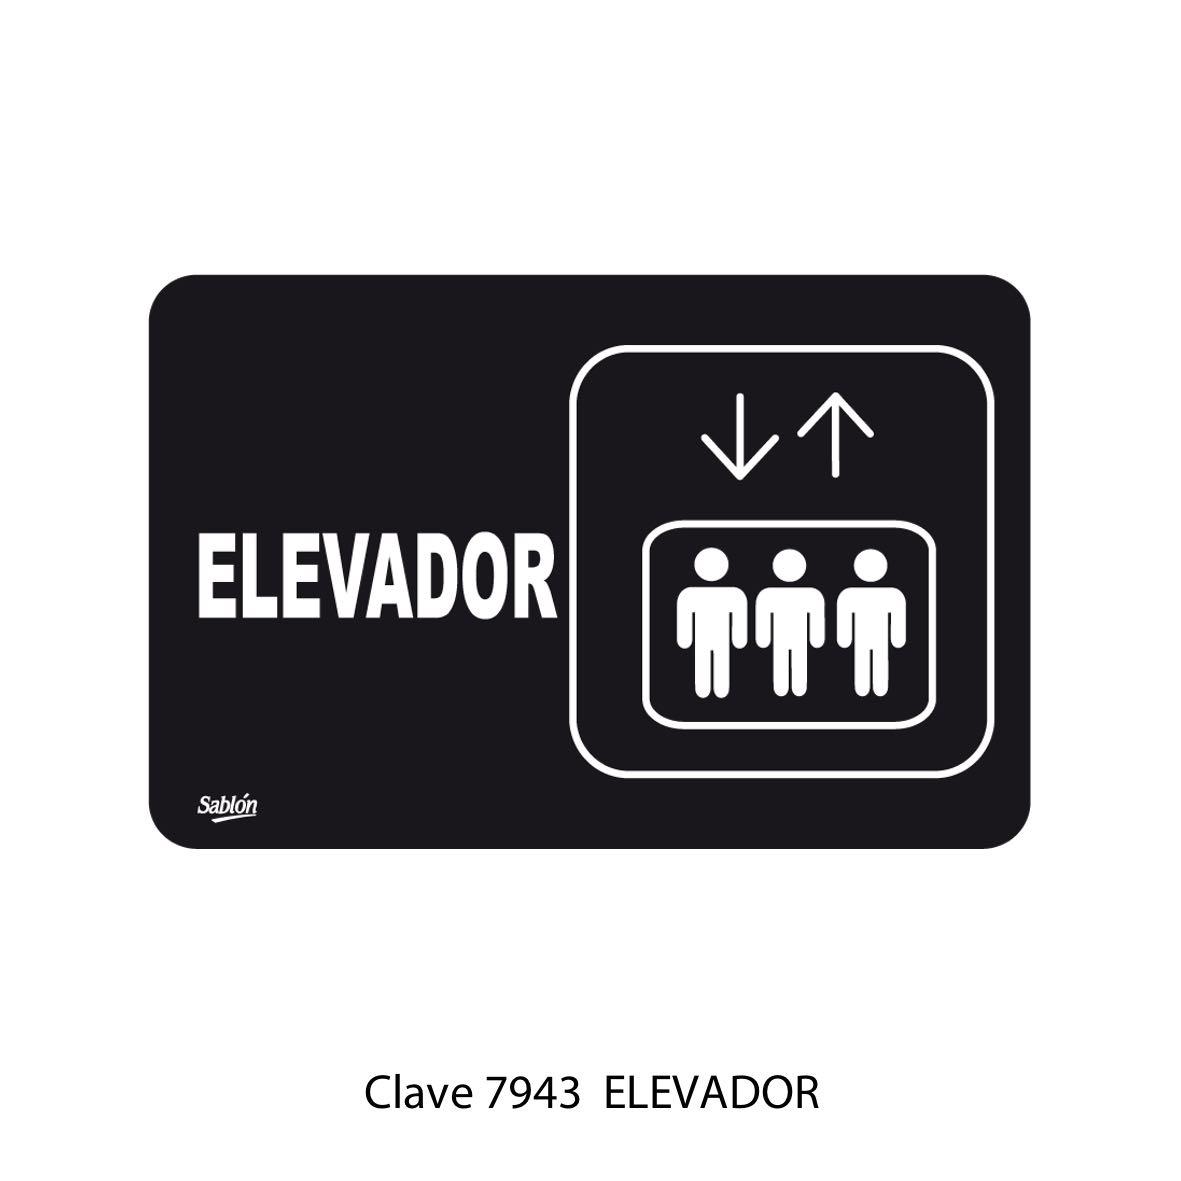 Señal Elevador Modelo 7943 - Sablón